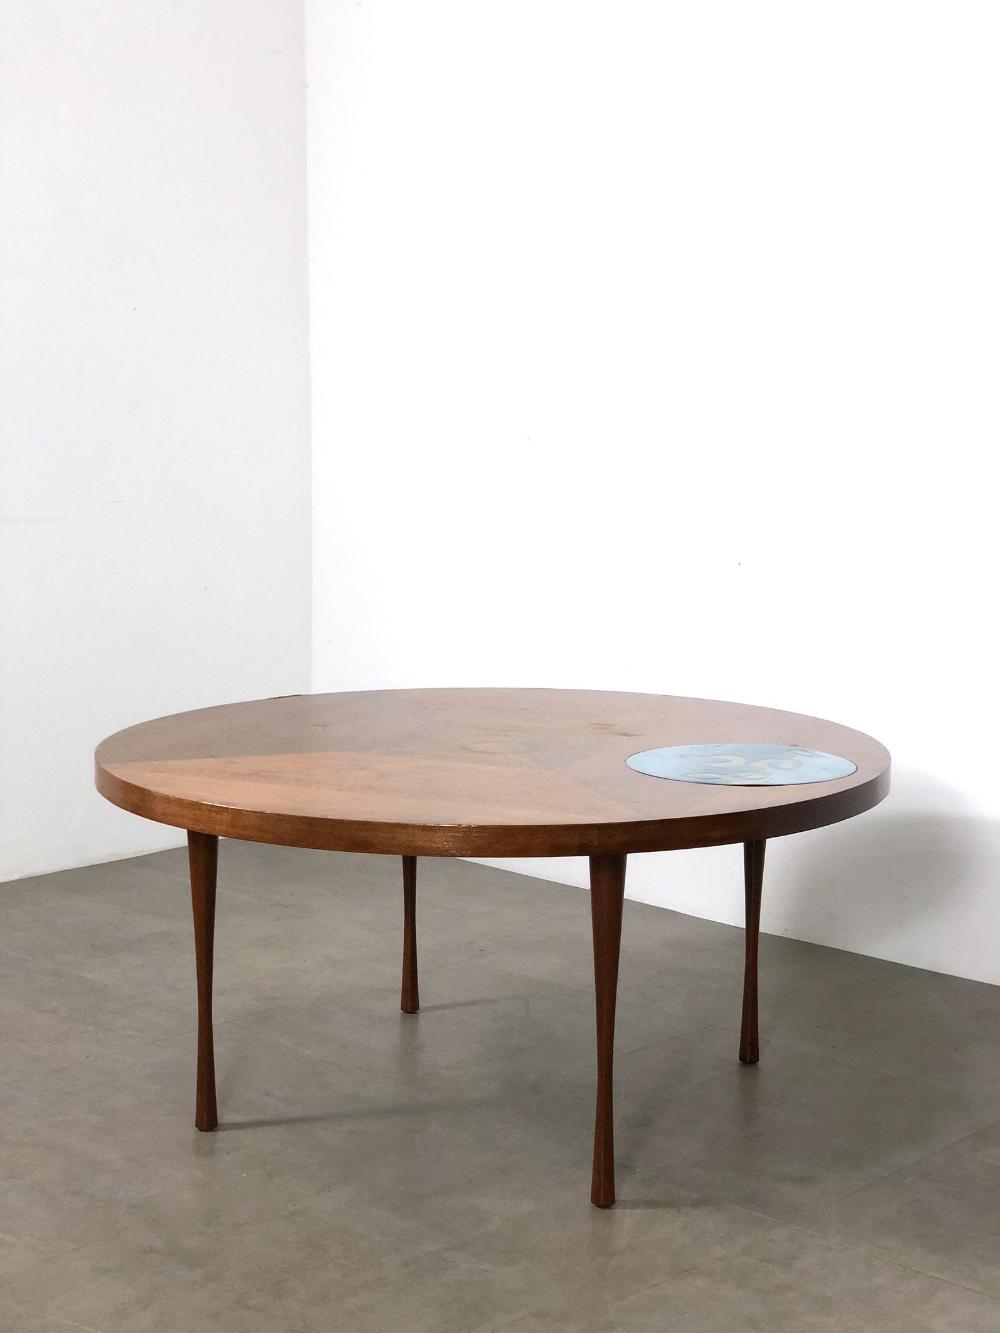 Vintage Walnut Enamel Round Coffee Table 1960 S Etsy Coffee Table Mid Century Modern Coffee Table Round Coffee Table [ 1333 x 1000 Pixel ]